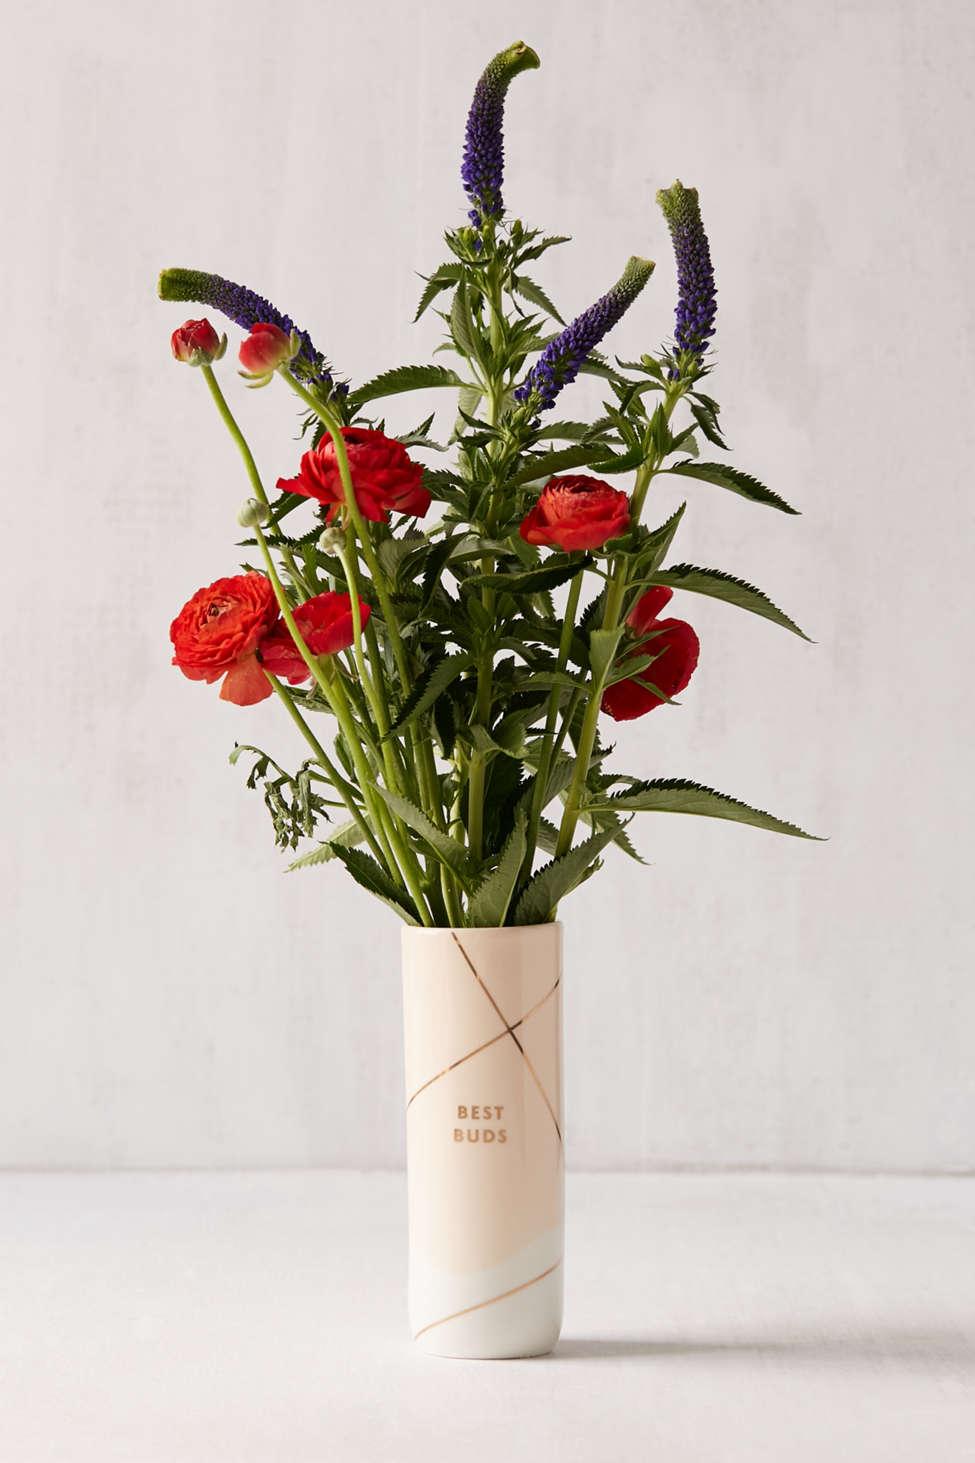 Slide View: 1: Fringe Studio Best Buds Ceramic Vase